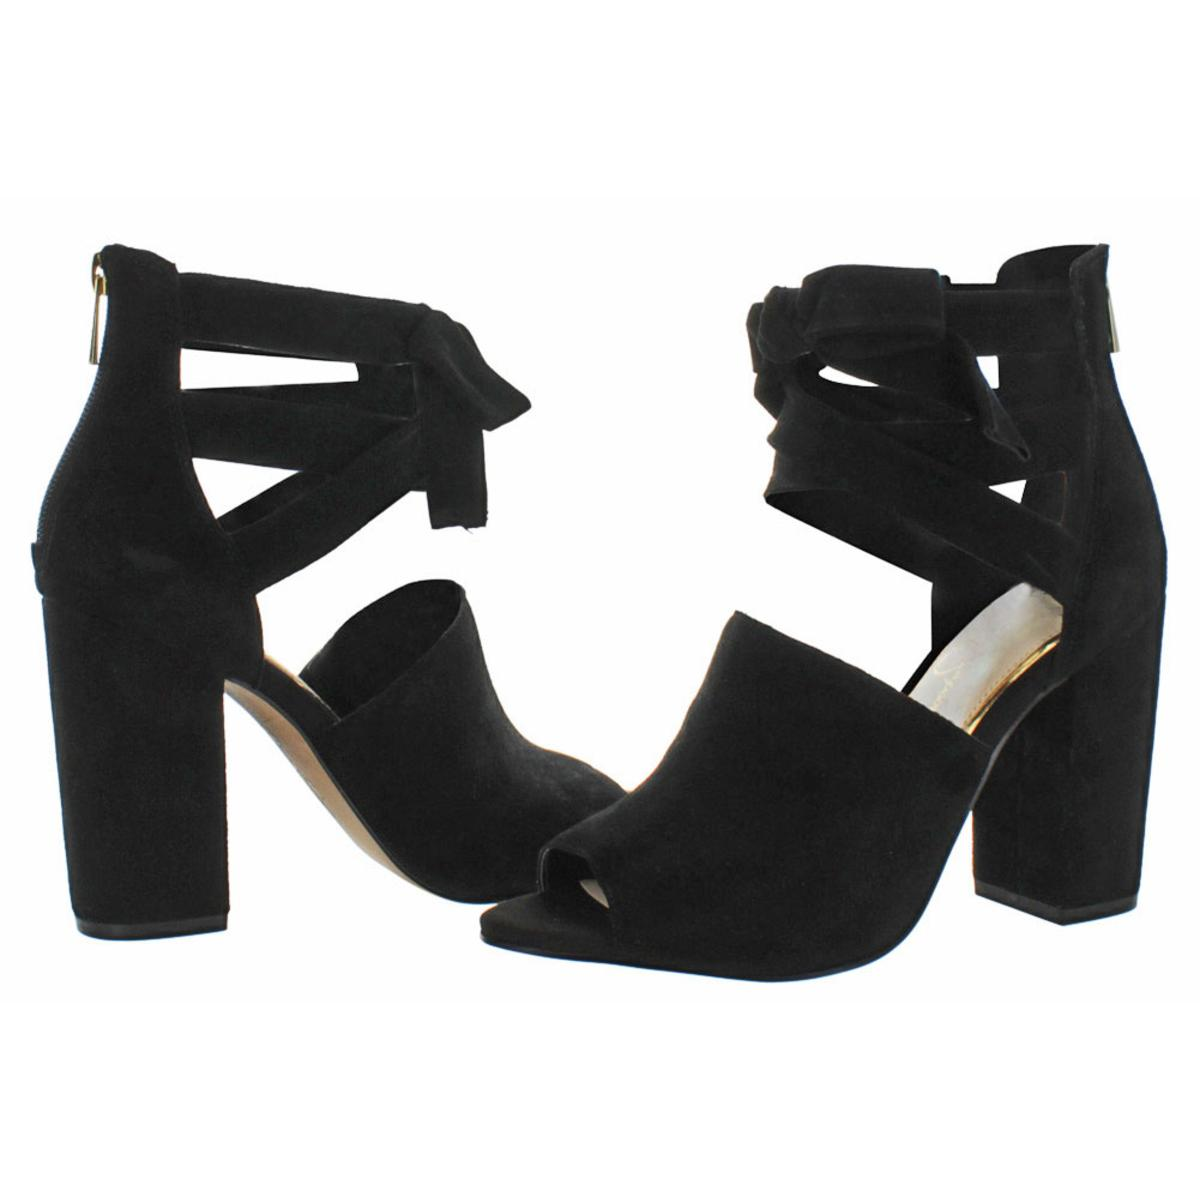 Jessica-Simpson-Kandiss-Women-039-s-Open-Toe-Block-Heel-Dress-Shoes thumbnail 5